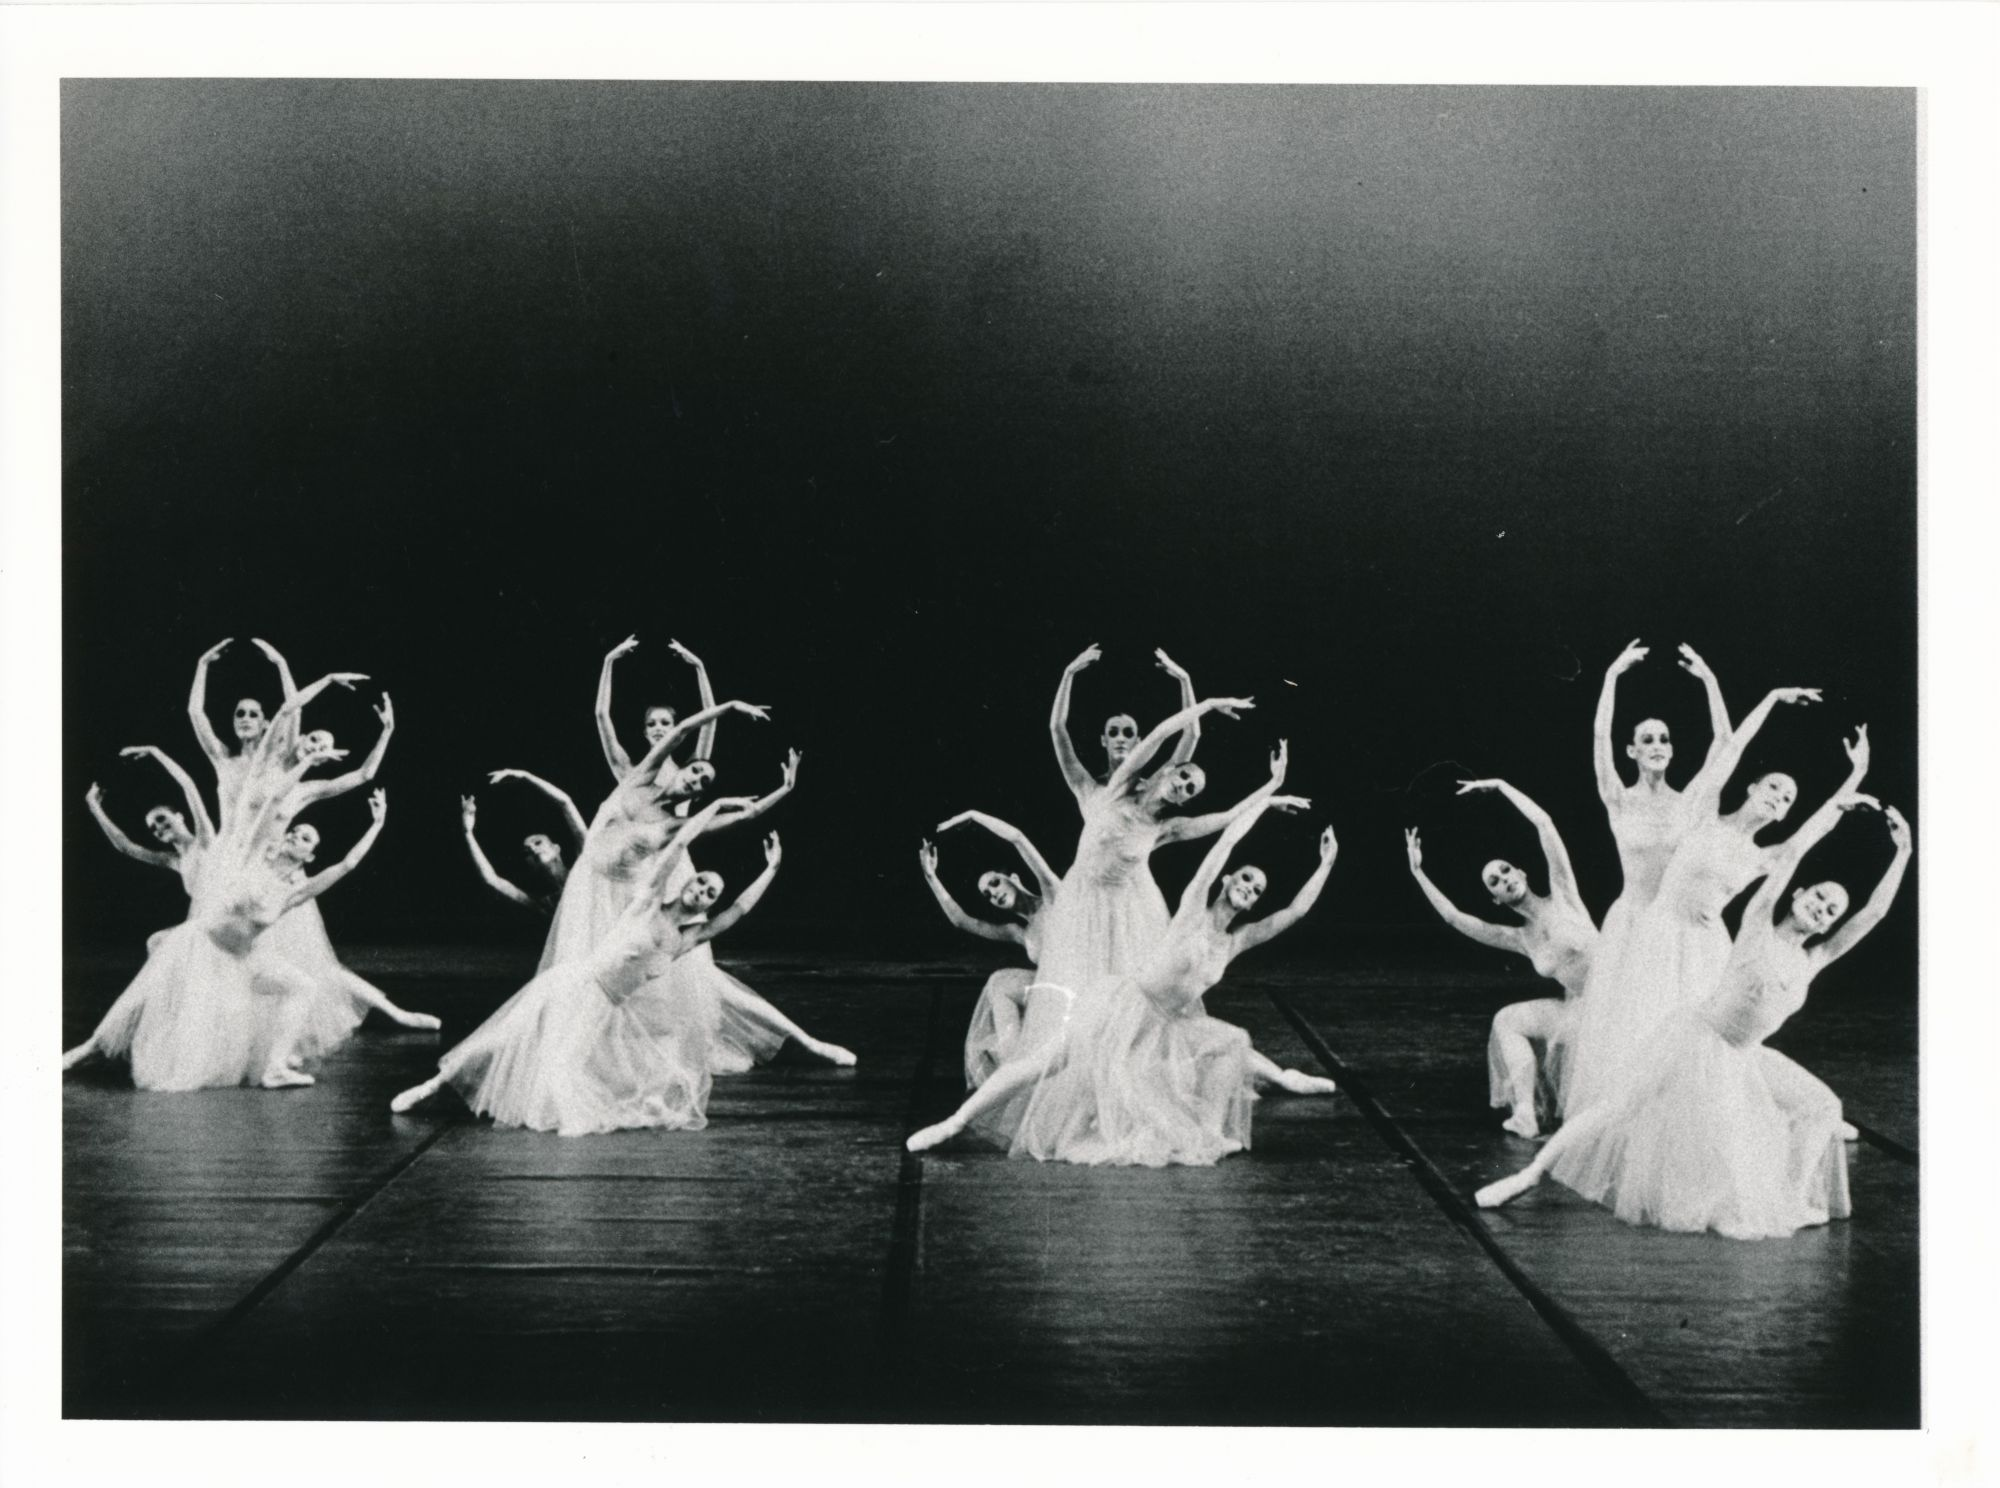 1987, Serenade, chor. George Balandine